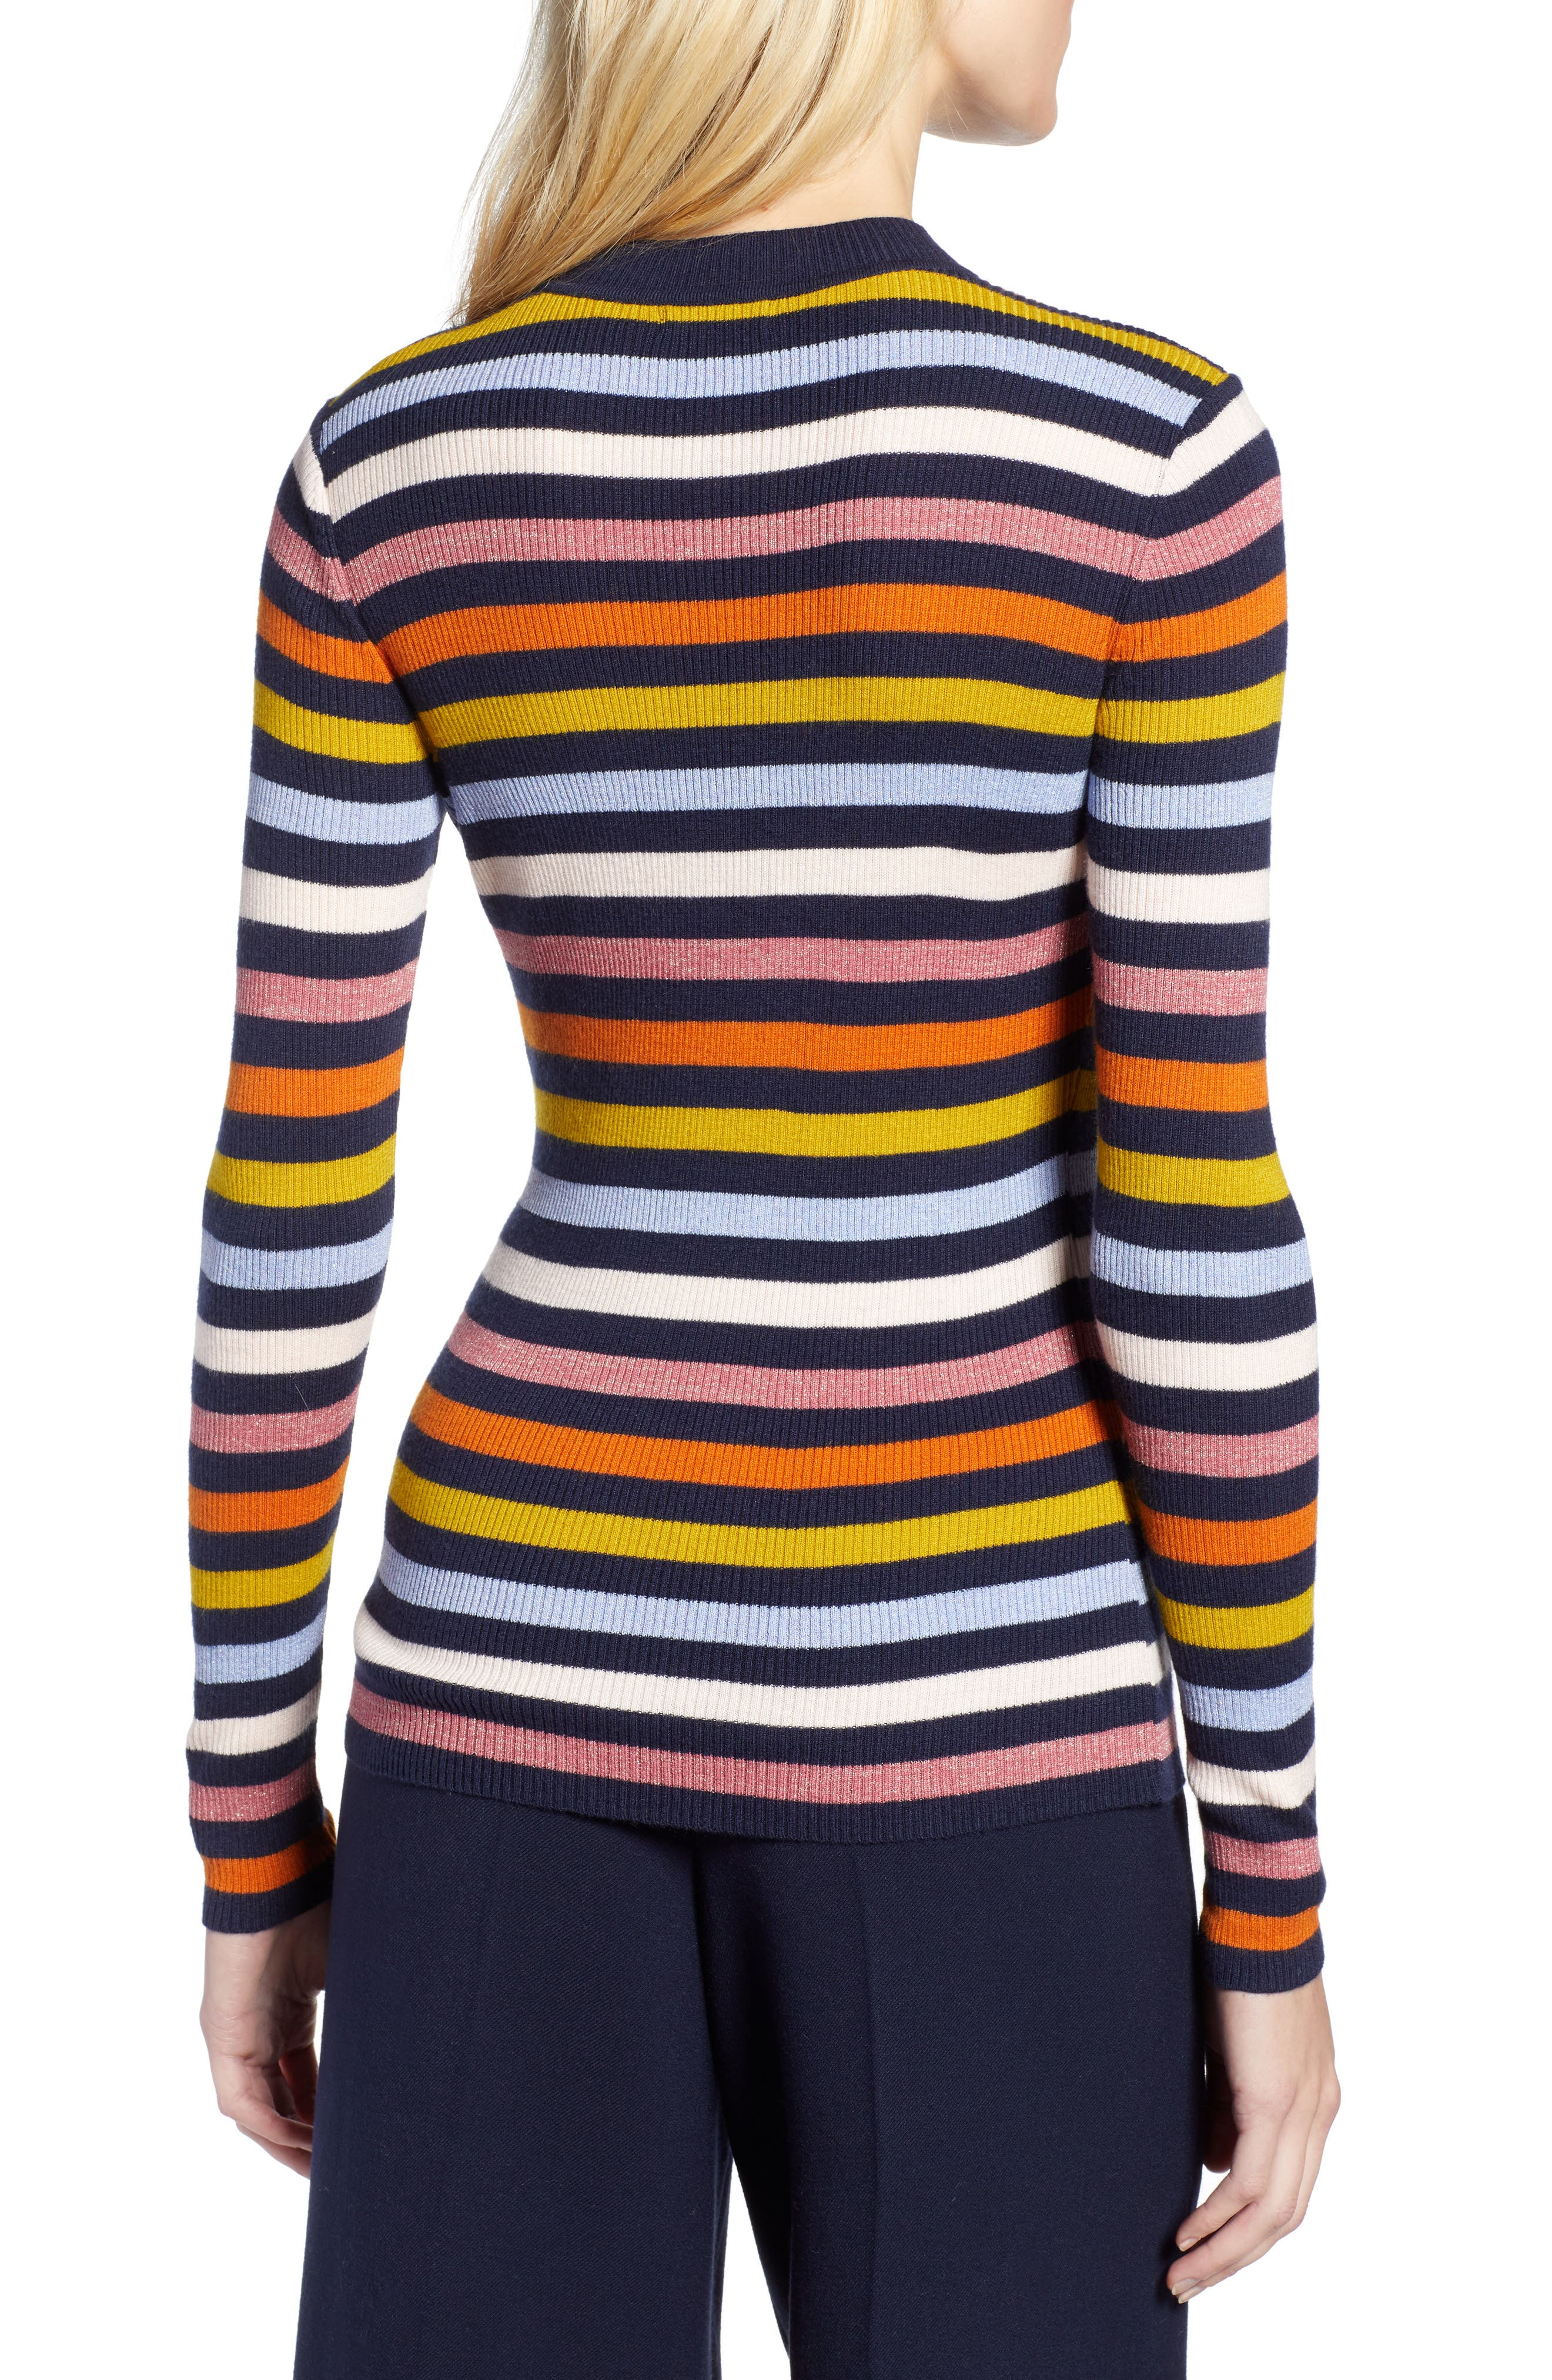 x Atlantic-Pacific Shimmer Stripe Sweater,                             Alternate thumbnail 3, color,                             NAVY MULTI STRIPE